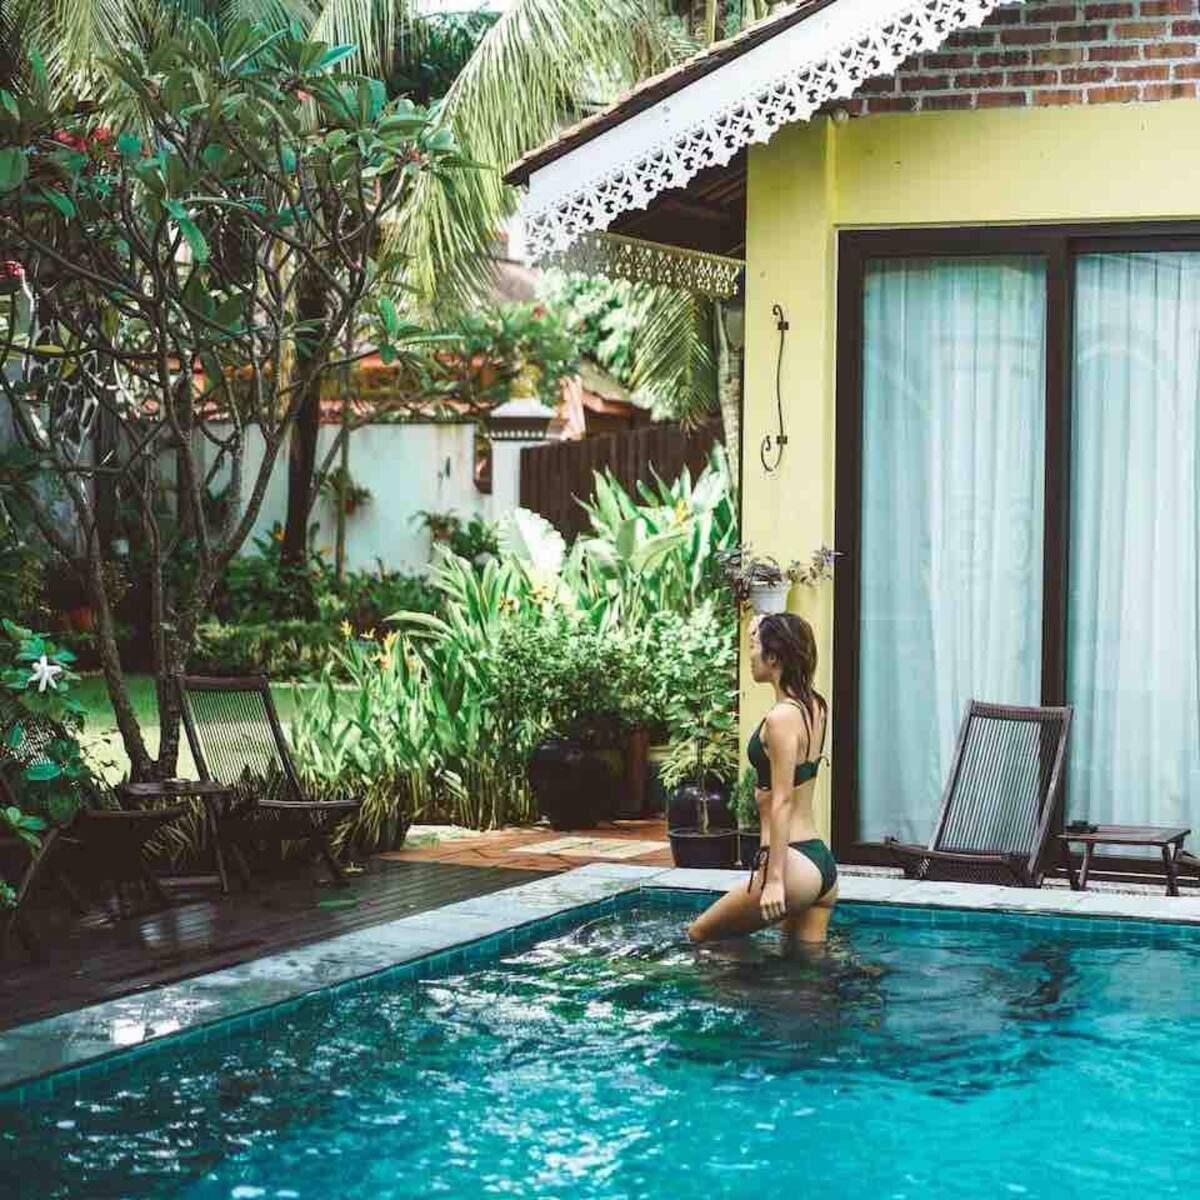 Casugria Dutch Melaka Chalet (Photo: Airbnb)